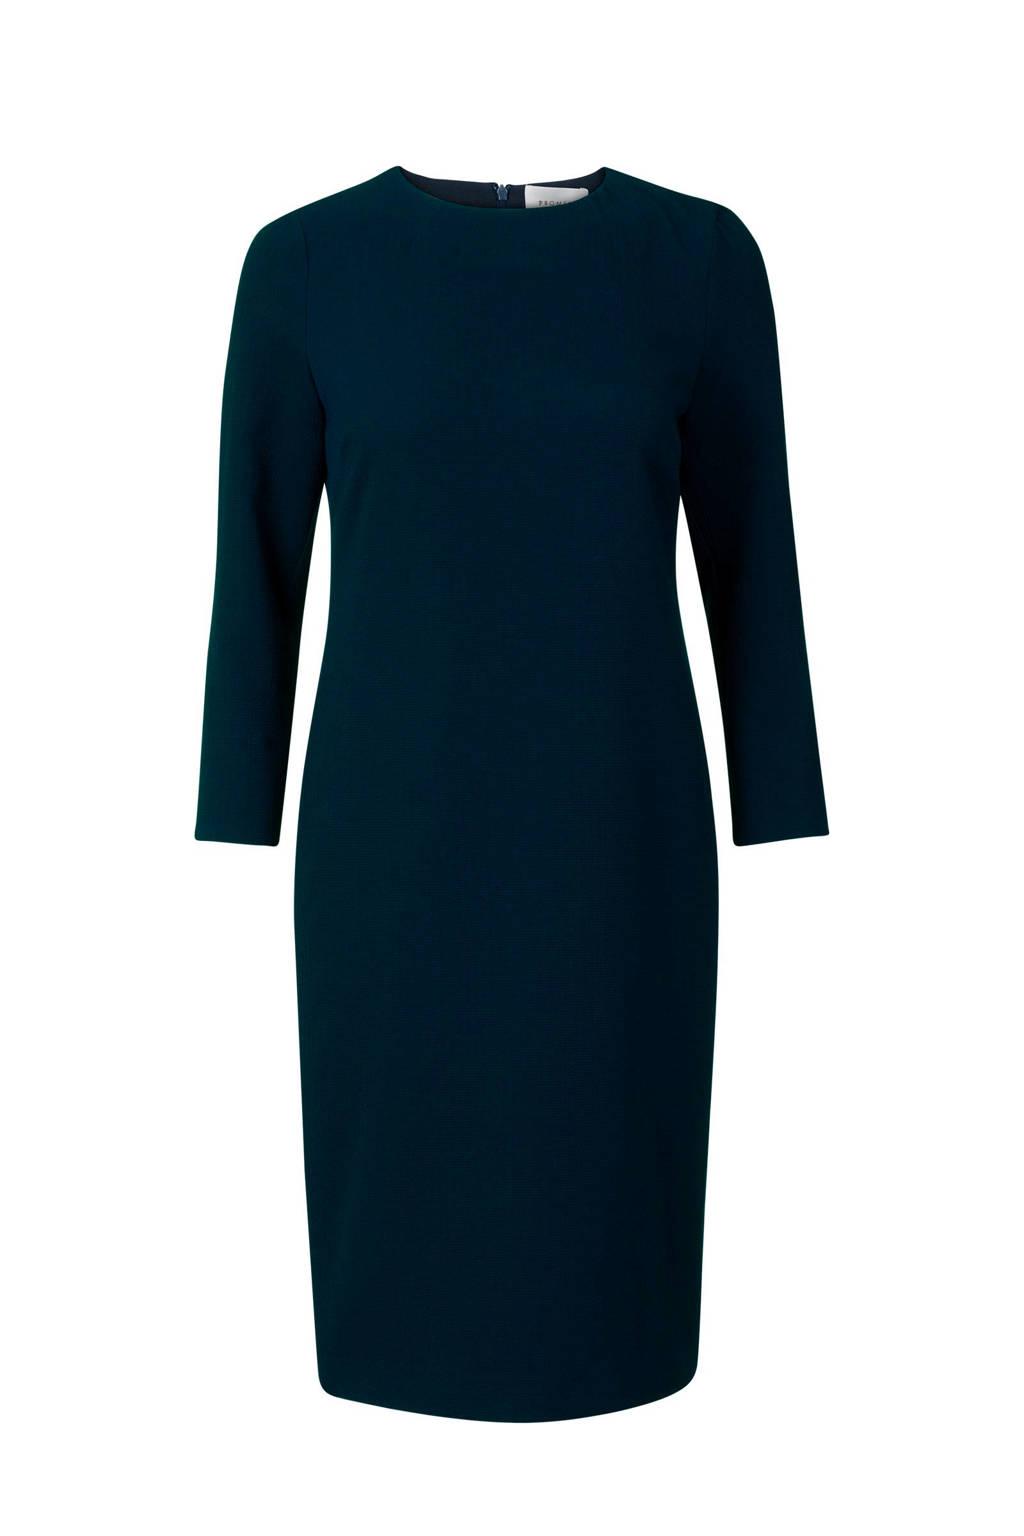 Promiss jurk donkerblauw, Donkerblauw